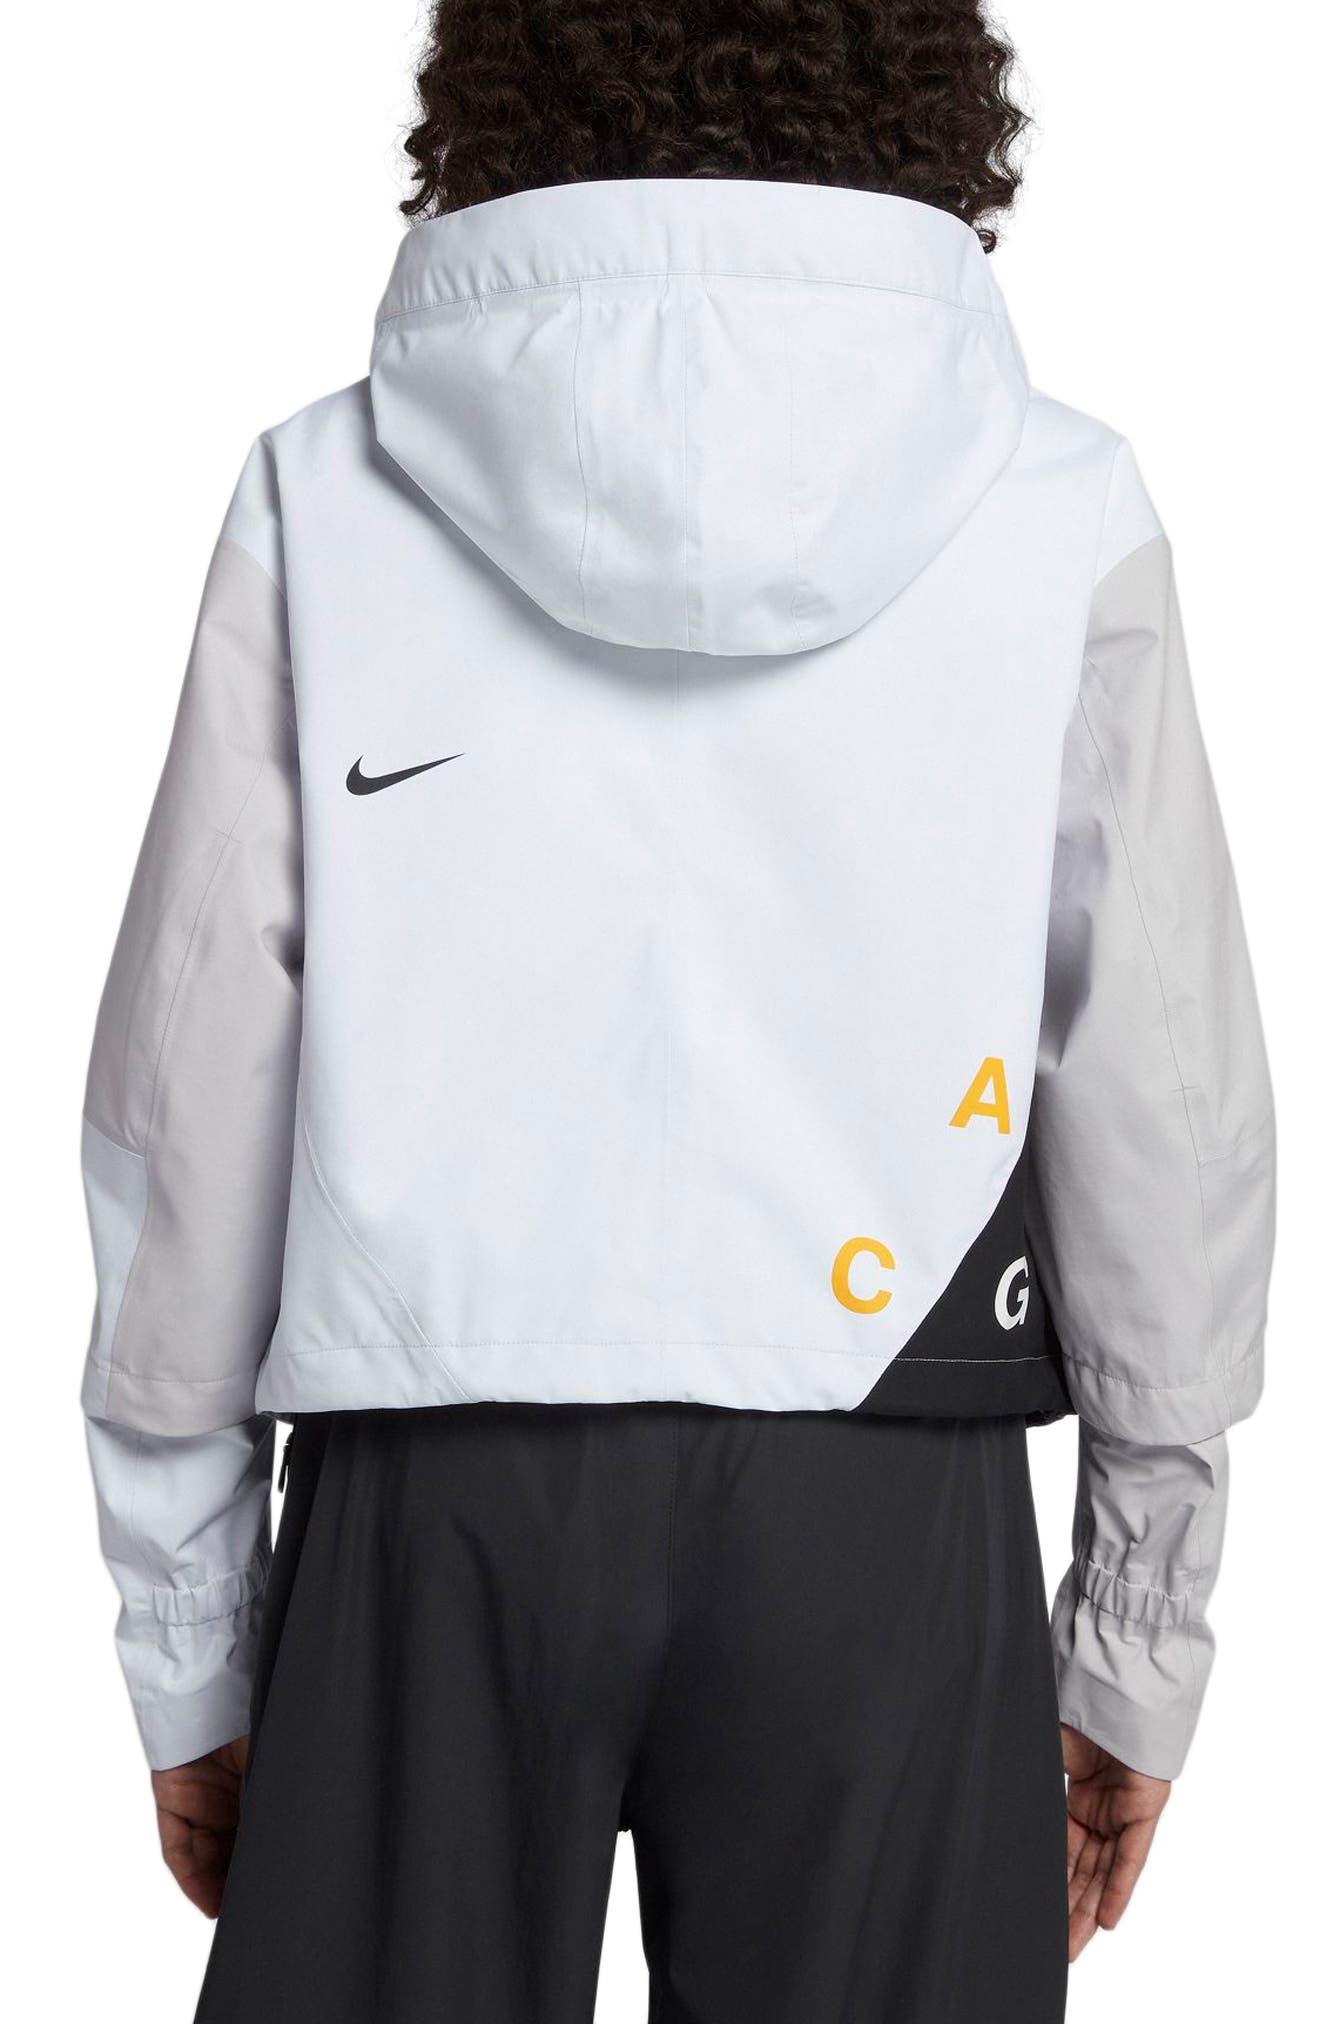 NikeLab ACG Gore-Tex<sup>®</sup> Women's Jacket,                             Alternate thumbnail 8, color,